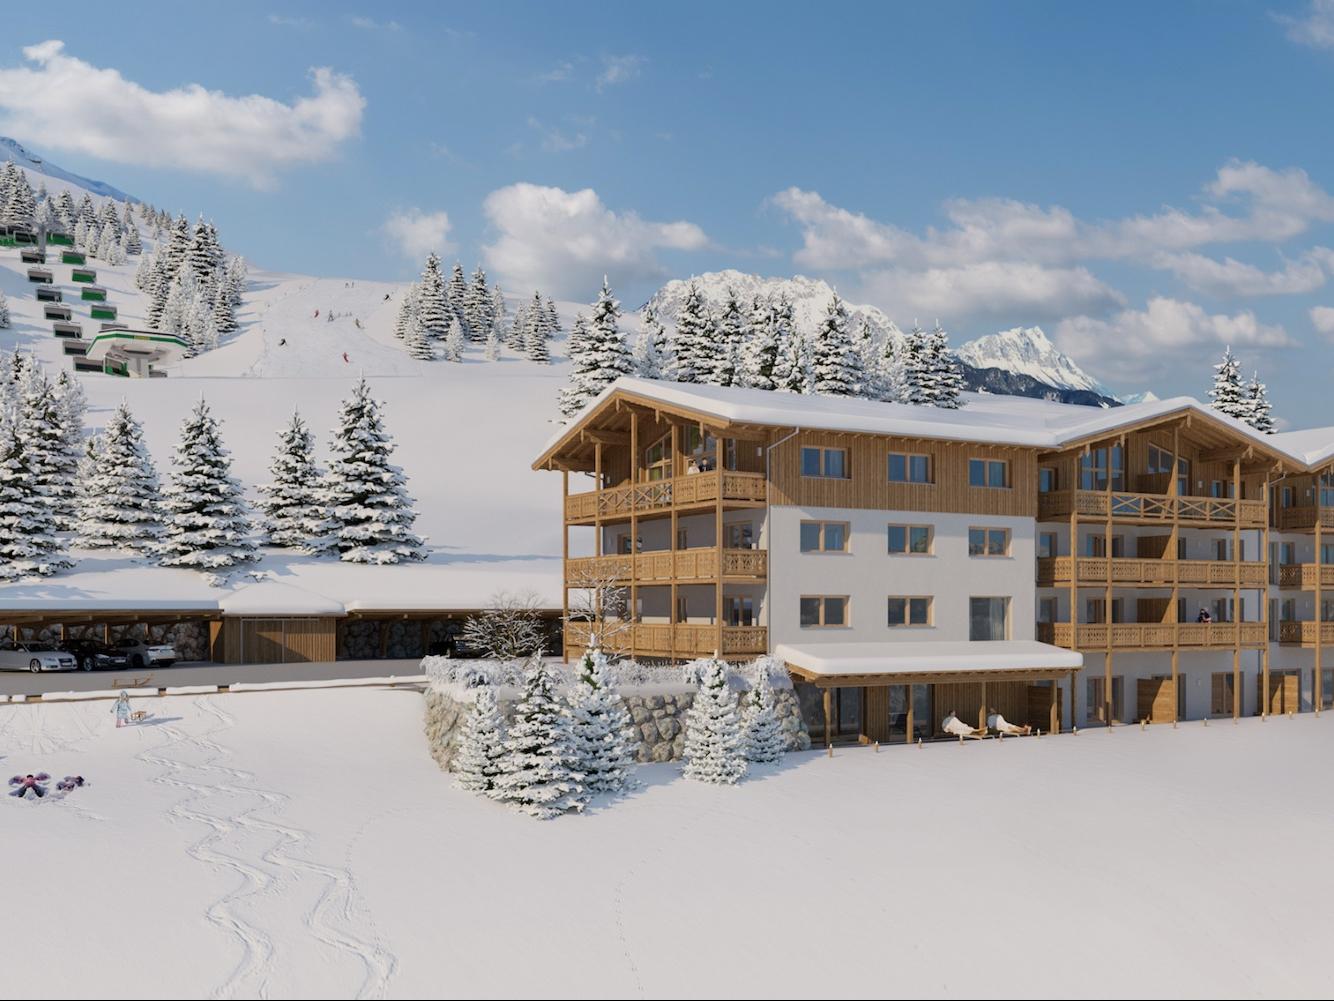 Appartement Skylodge Alpine Homes type I